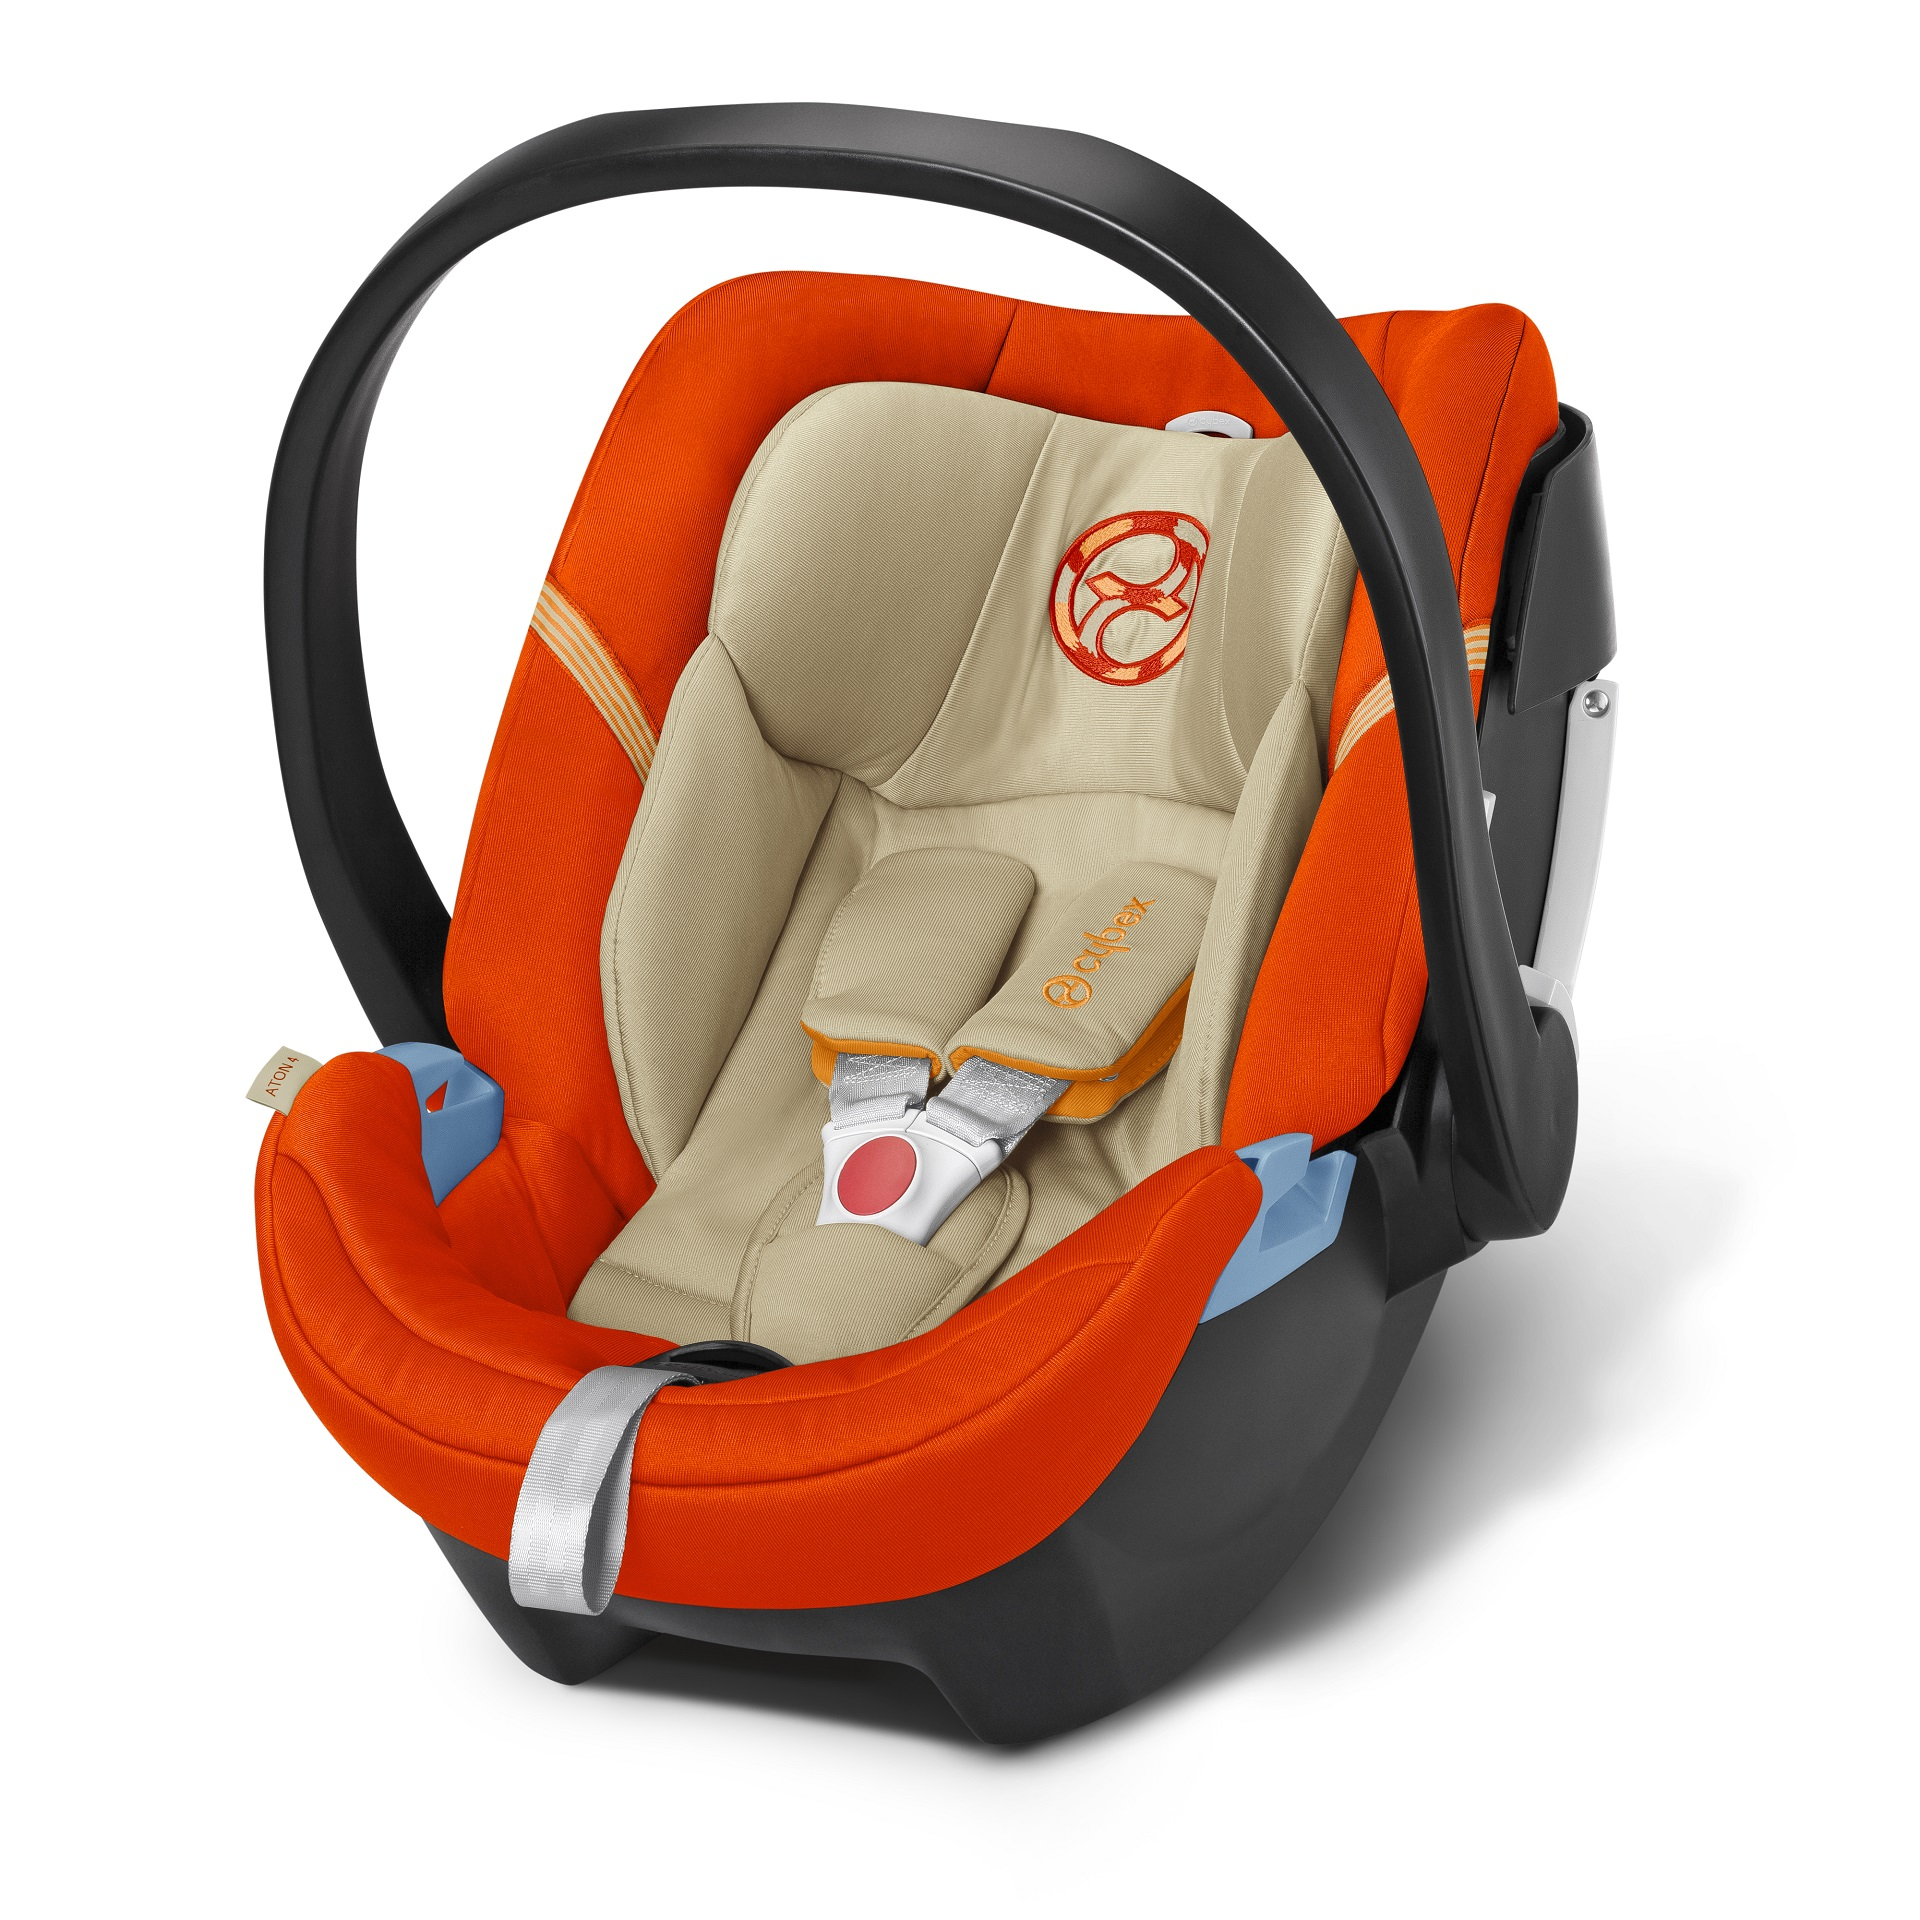 cybex infant carrier aton 4 2016 autumn gold burnt red buy at kidsroom car seats. Black Bedroom Furniture Sets. Home Design Ideas